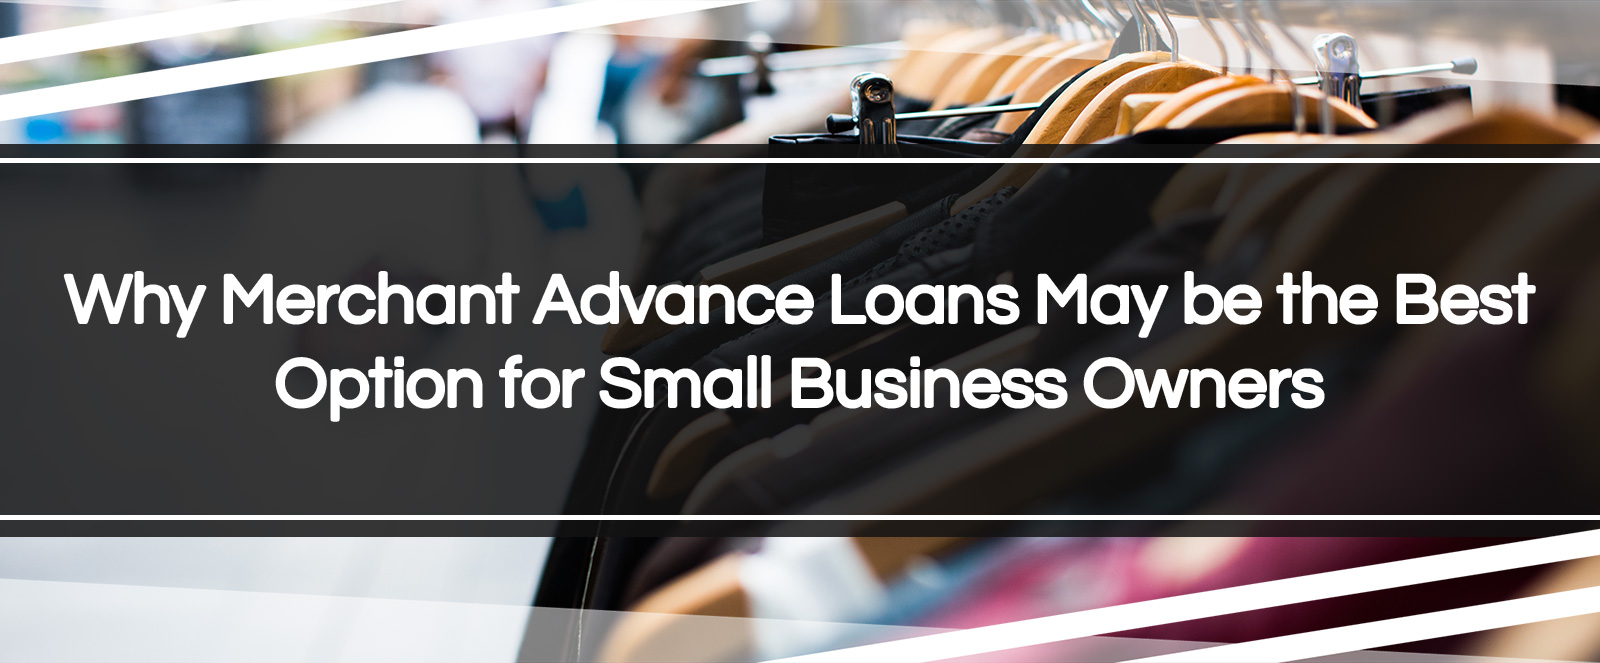 merchant advance loans